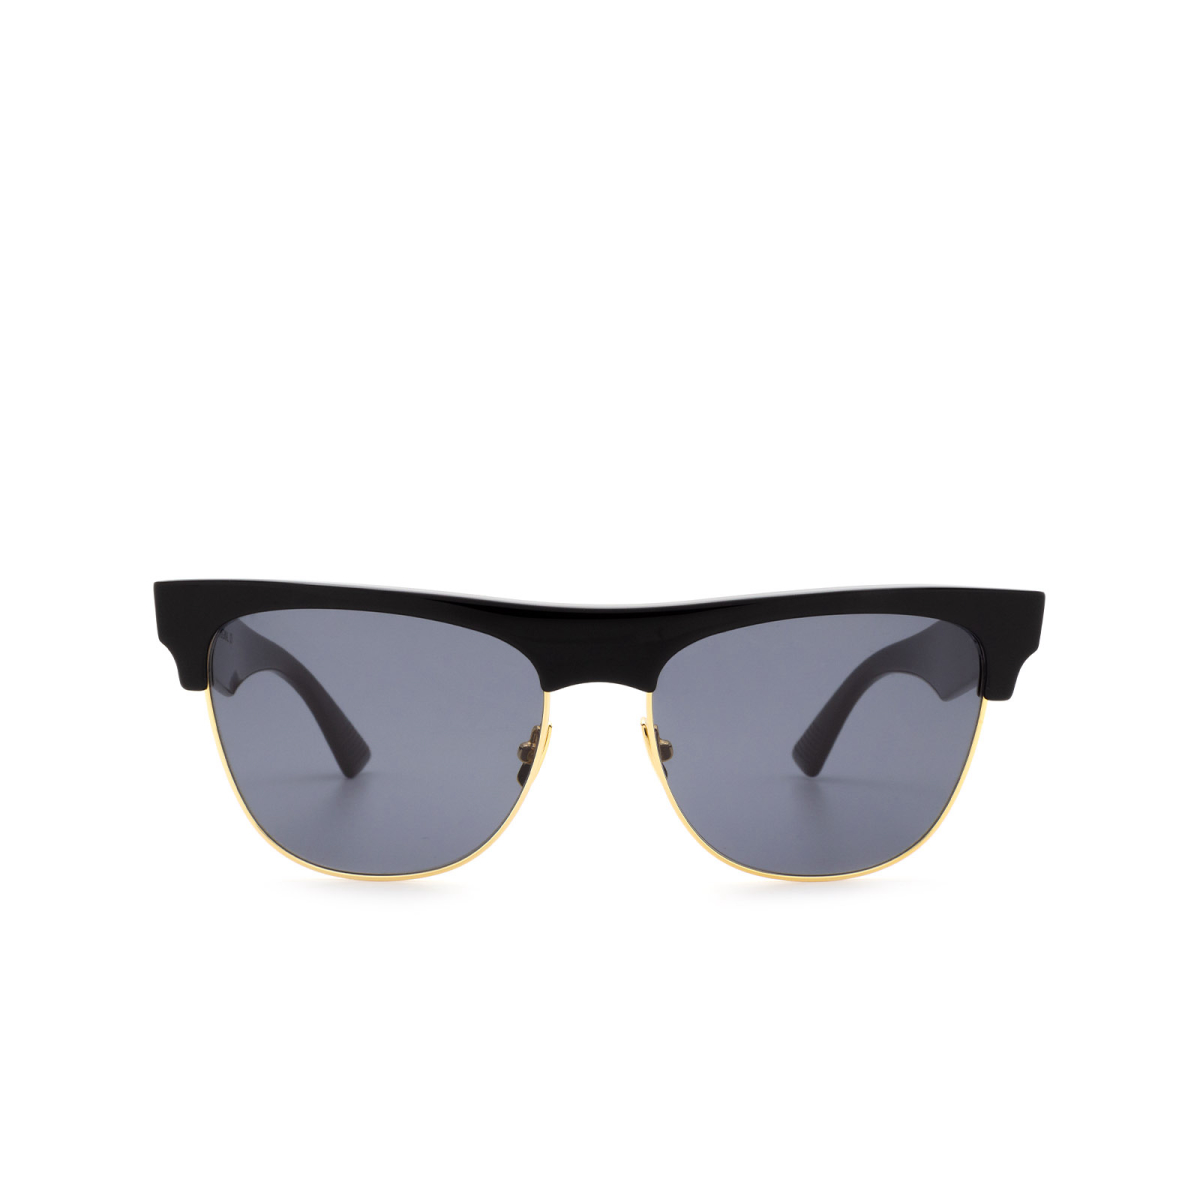 Bottega Veneta® Square Sunglasses: BV1003S color Black 001.